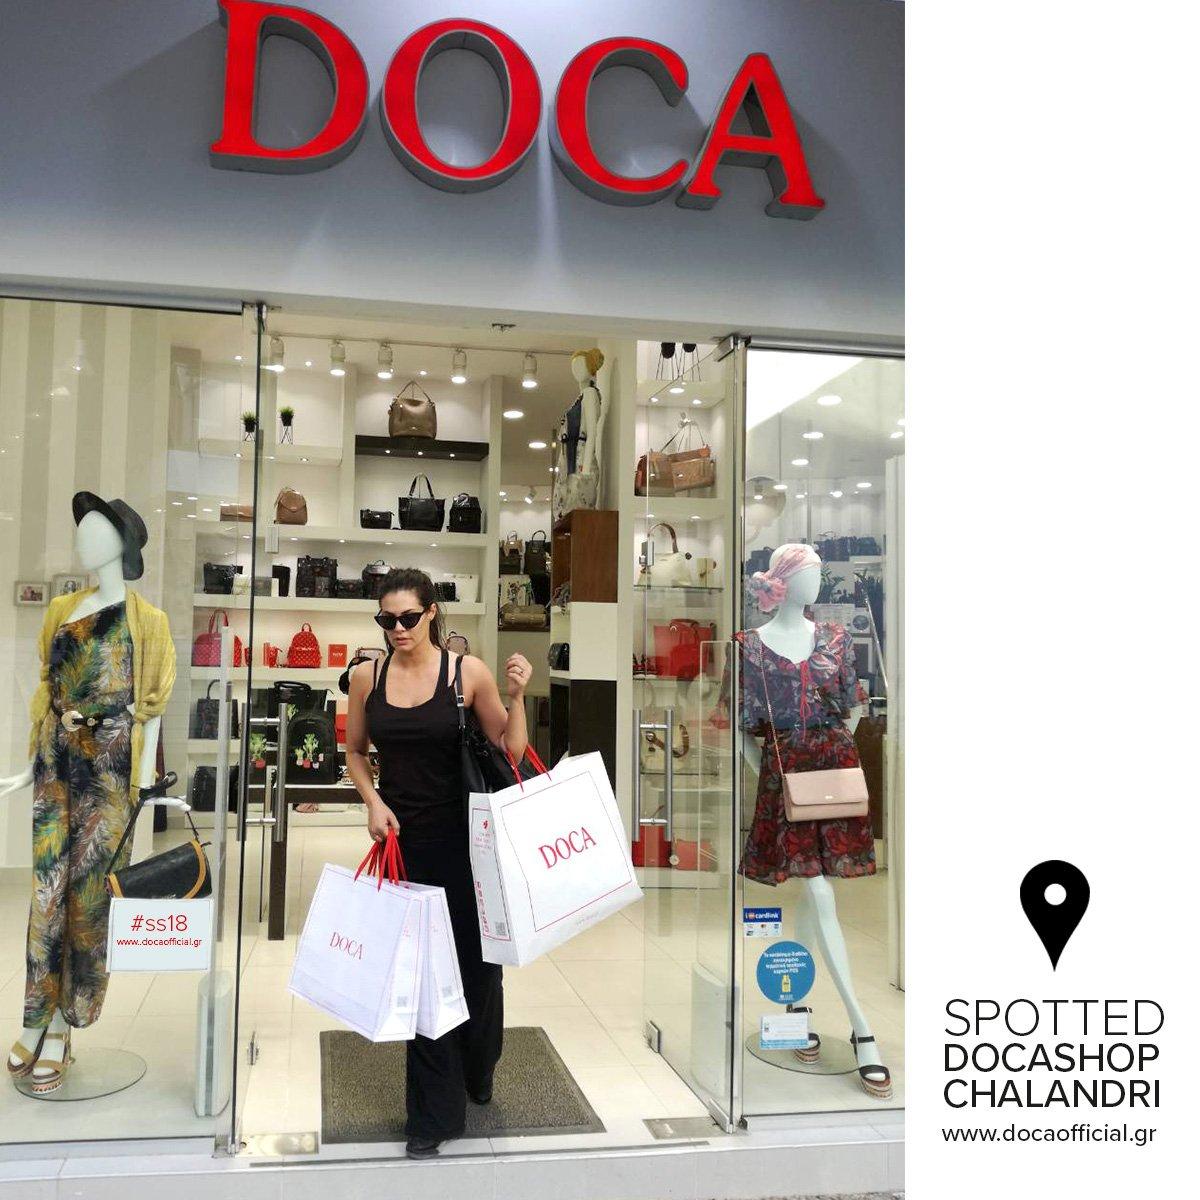 34dc6727e4 ... Platonos 8 Find your nearest DOCA shop at http   docaofficial.com  doca   docaofficial  spring  summer  collection  fashion  bag  accessories ...